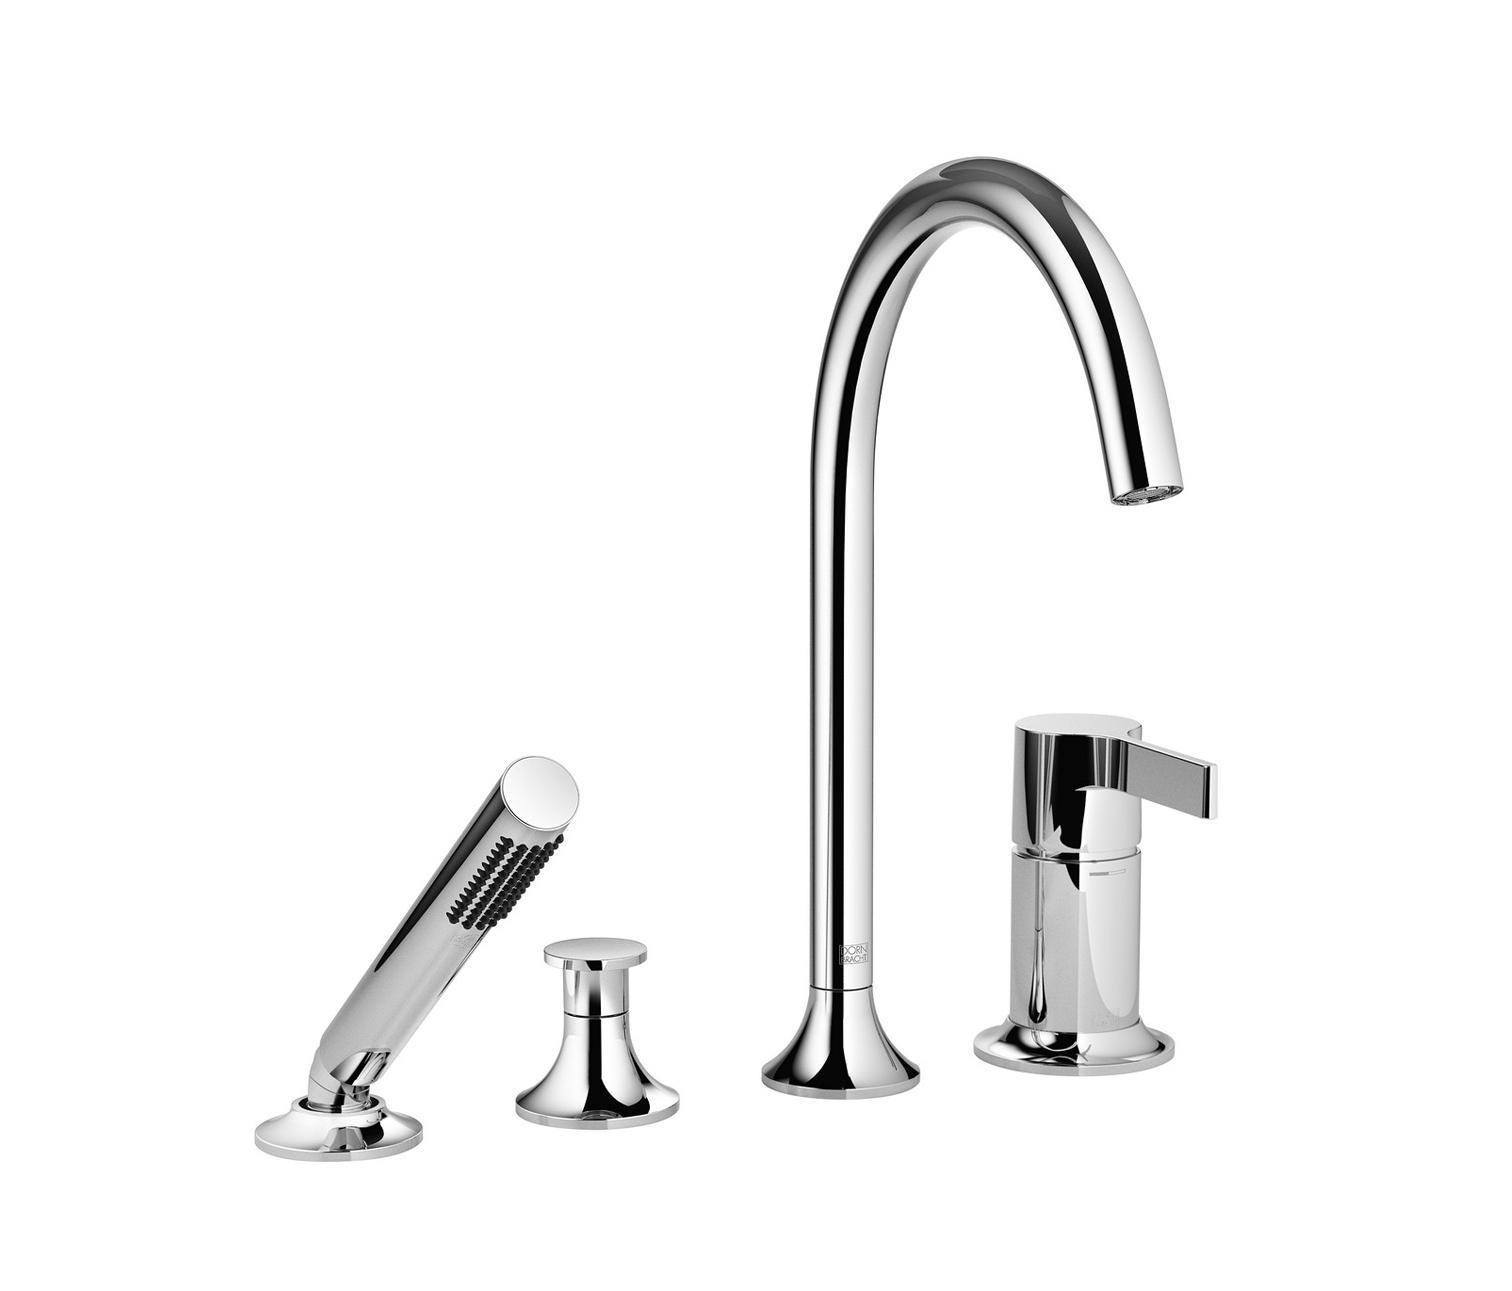 vaia four hole single lever bath mixer bath taps from. Black Bedroom Furniture Sets. Home Design Ideas